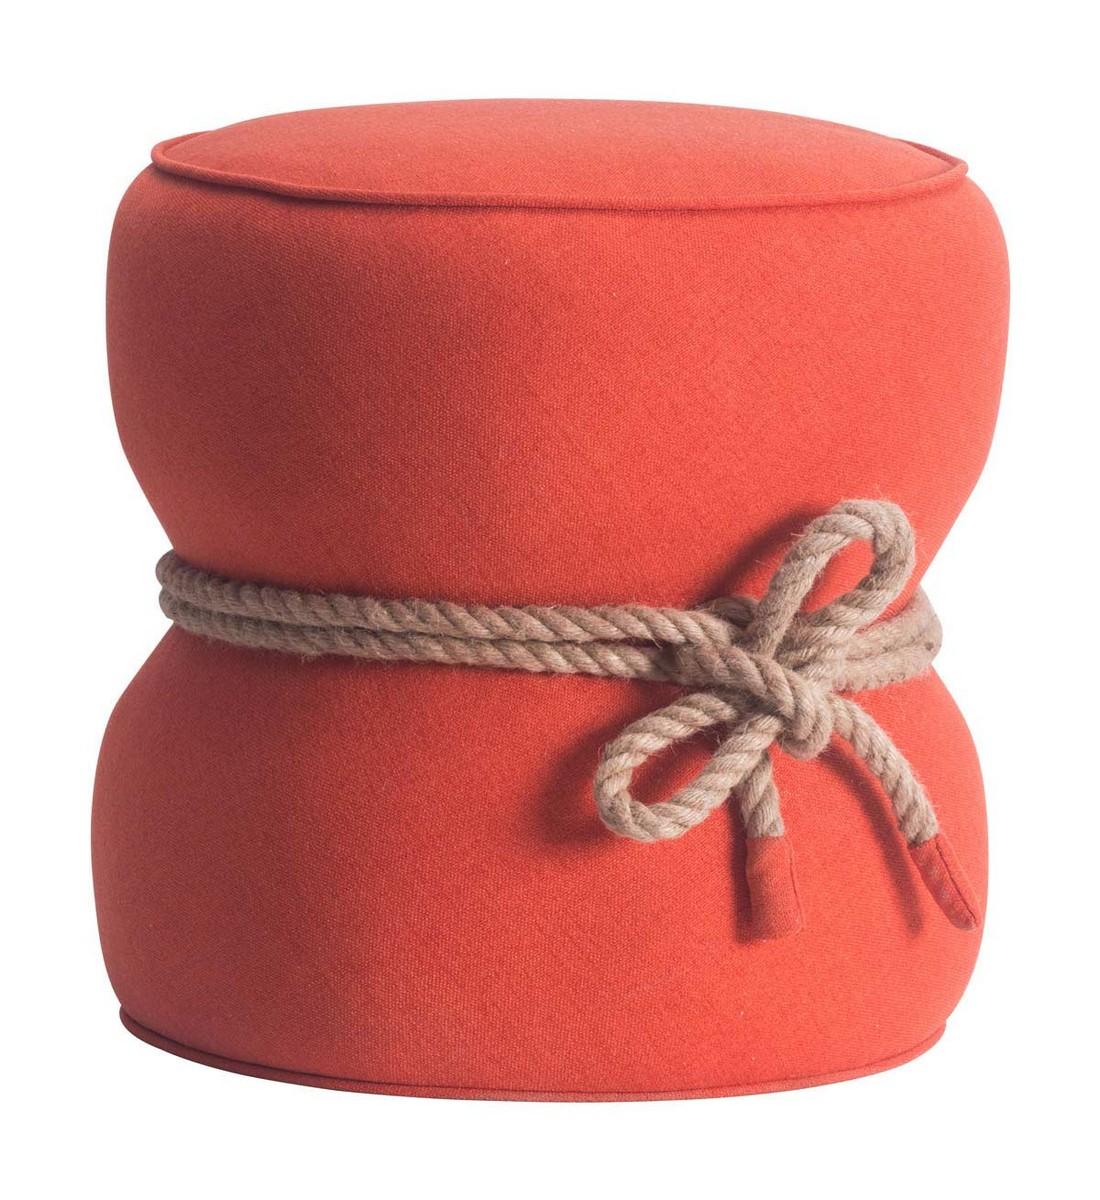 Zuo Modern Tubby Ottoman - Orange